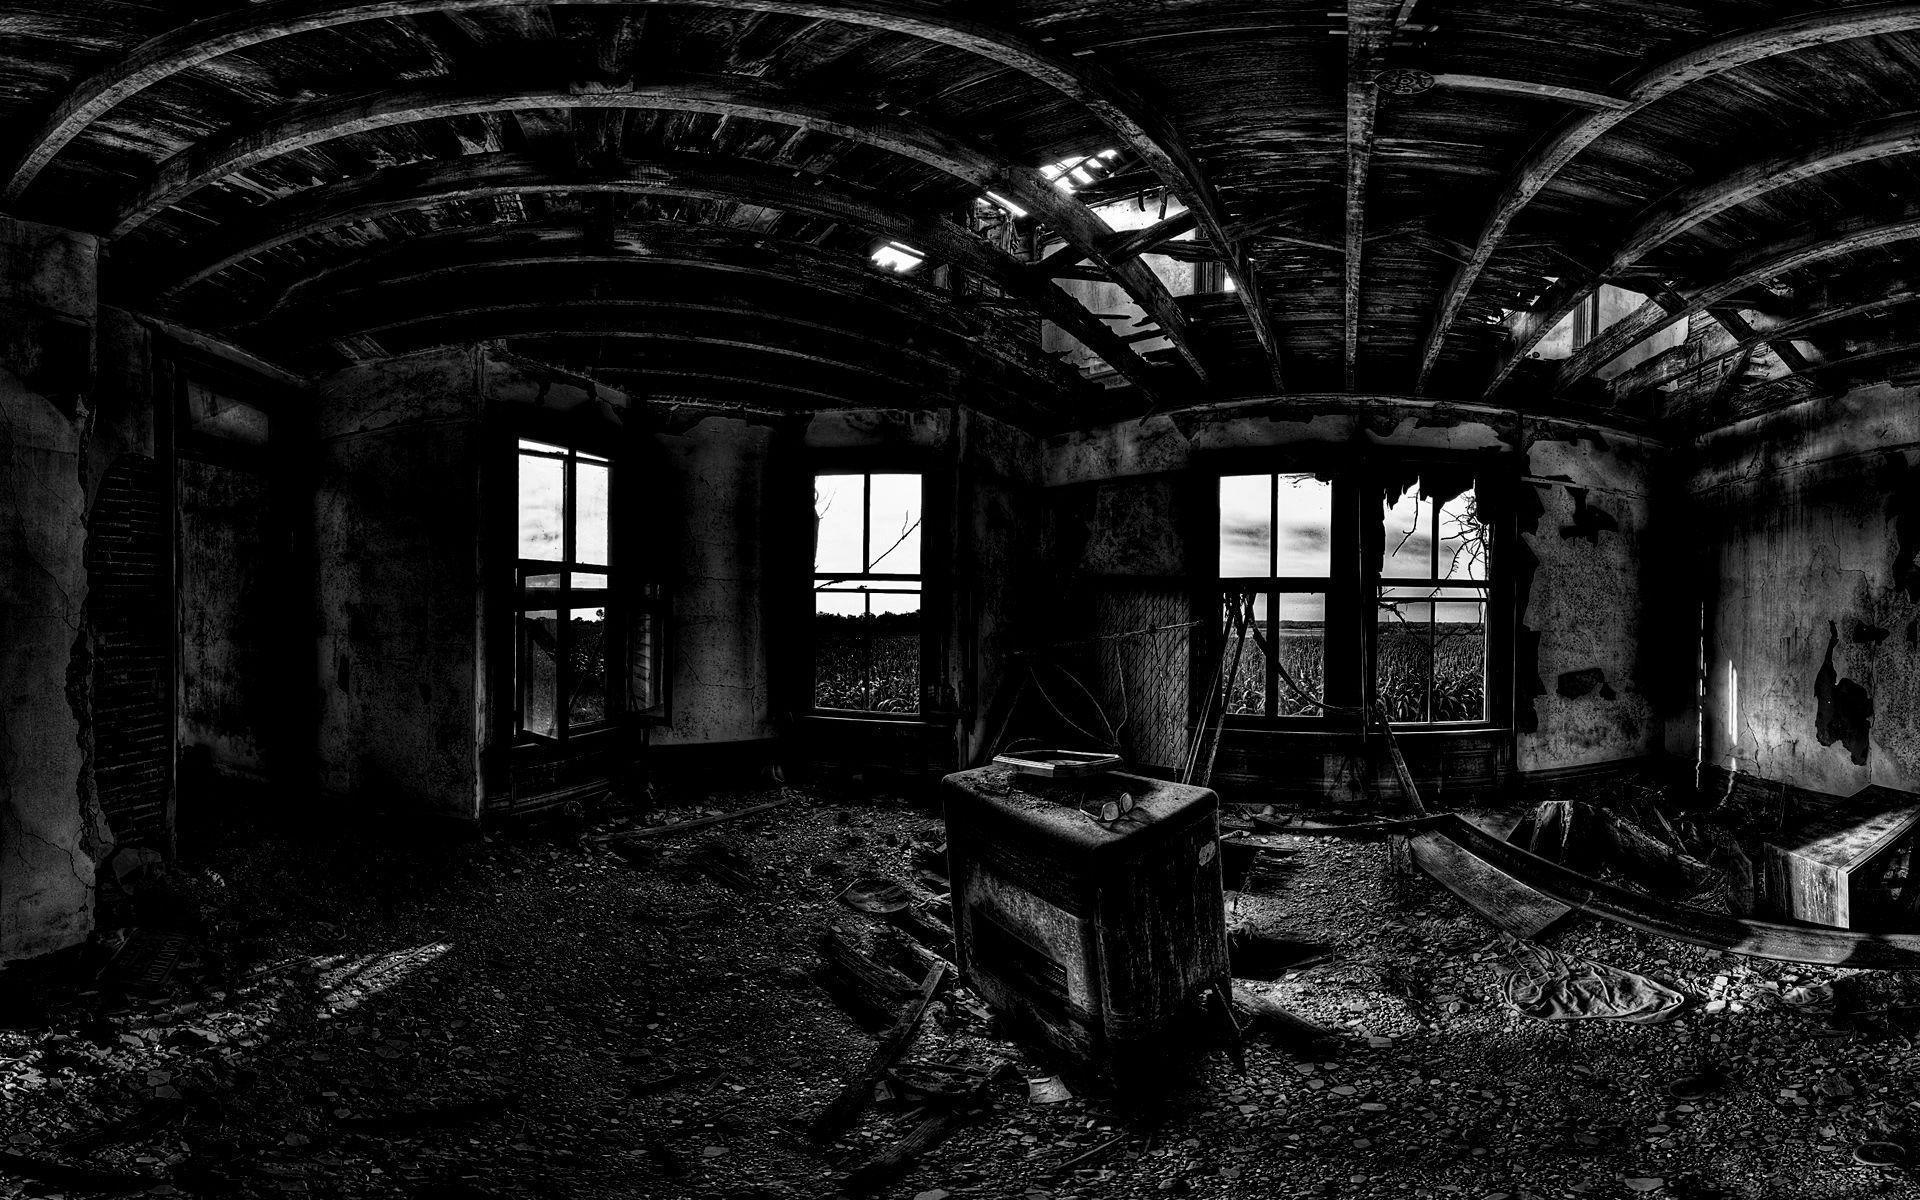 Dark hd wallpapers wallpaper cave - Hd wallpapers of darkness ...